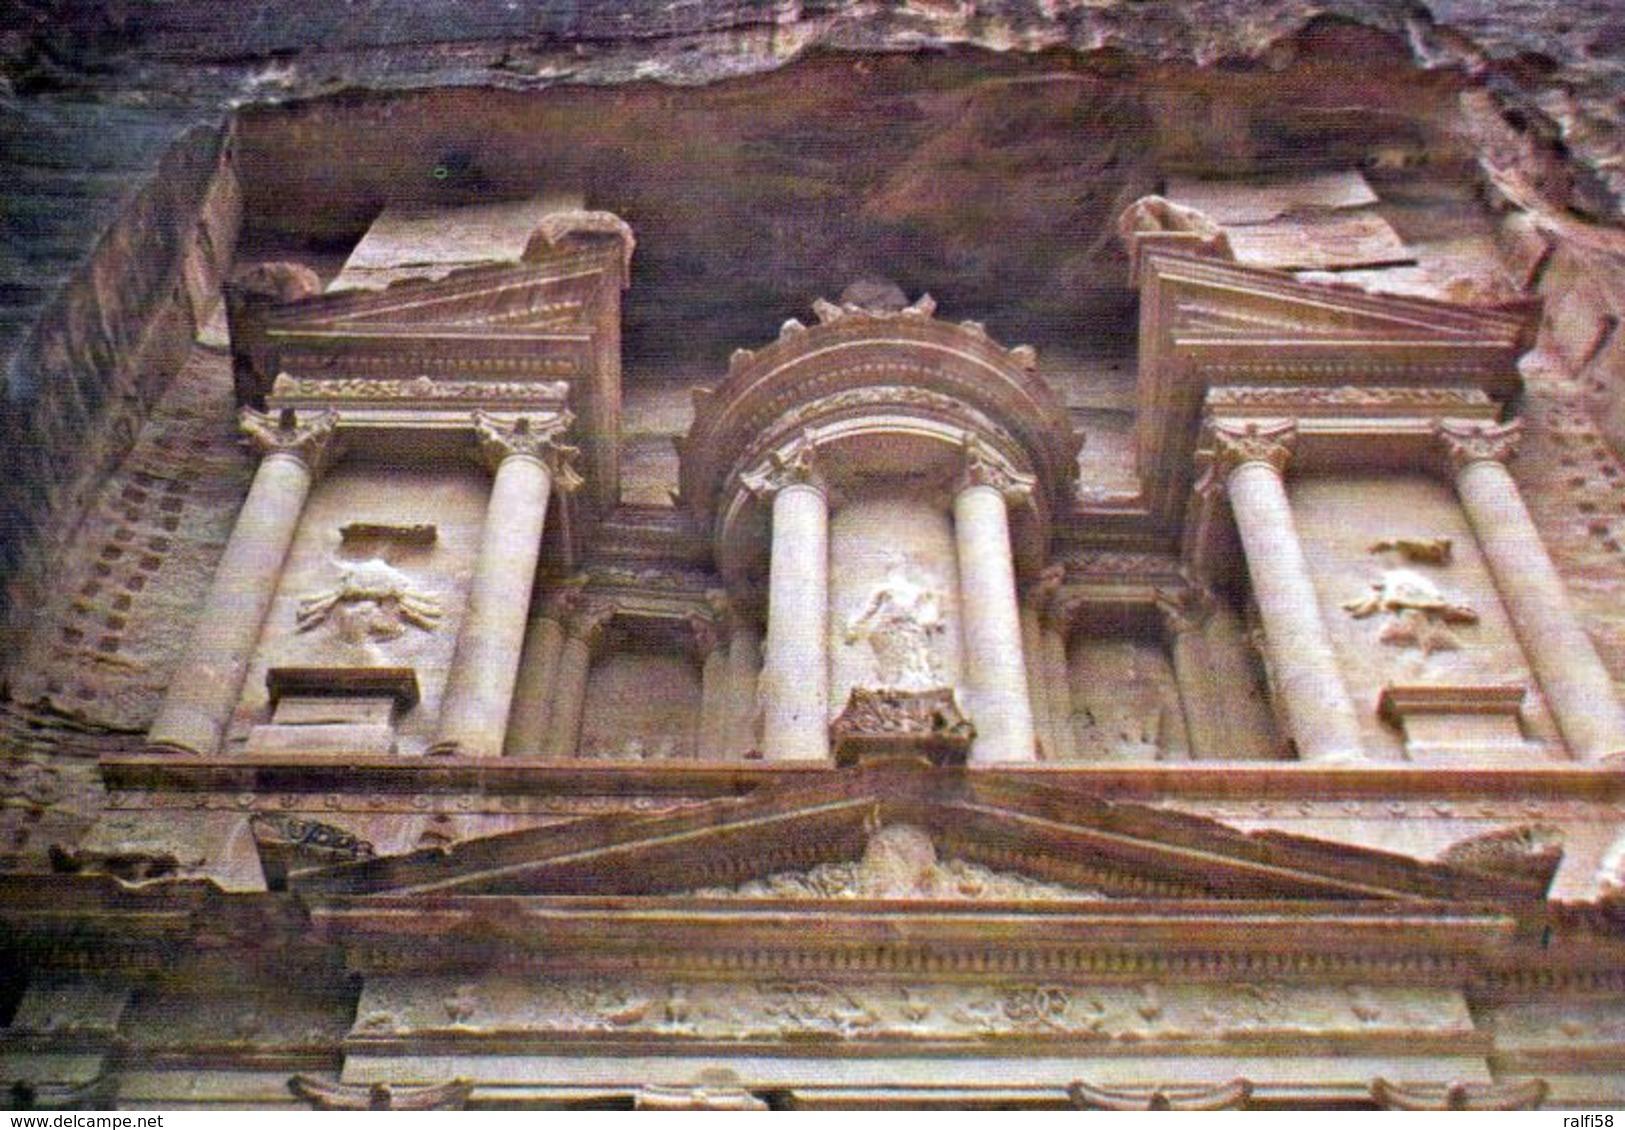 1 AK Jordanien * Details Vom Berühmtesten Bauwerk Petras Dem Khazne Al-Firaun Erbaut Im 1. Jh. Heute Weltkulturerbe * - Jordanien